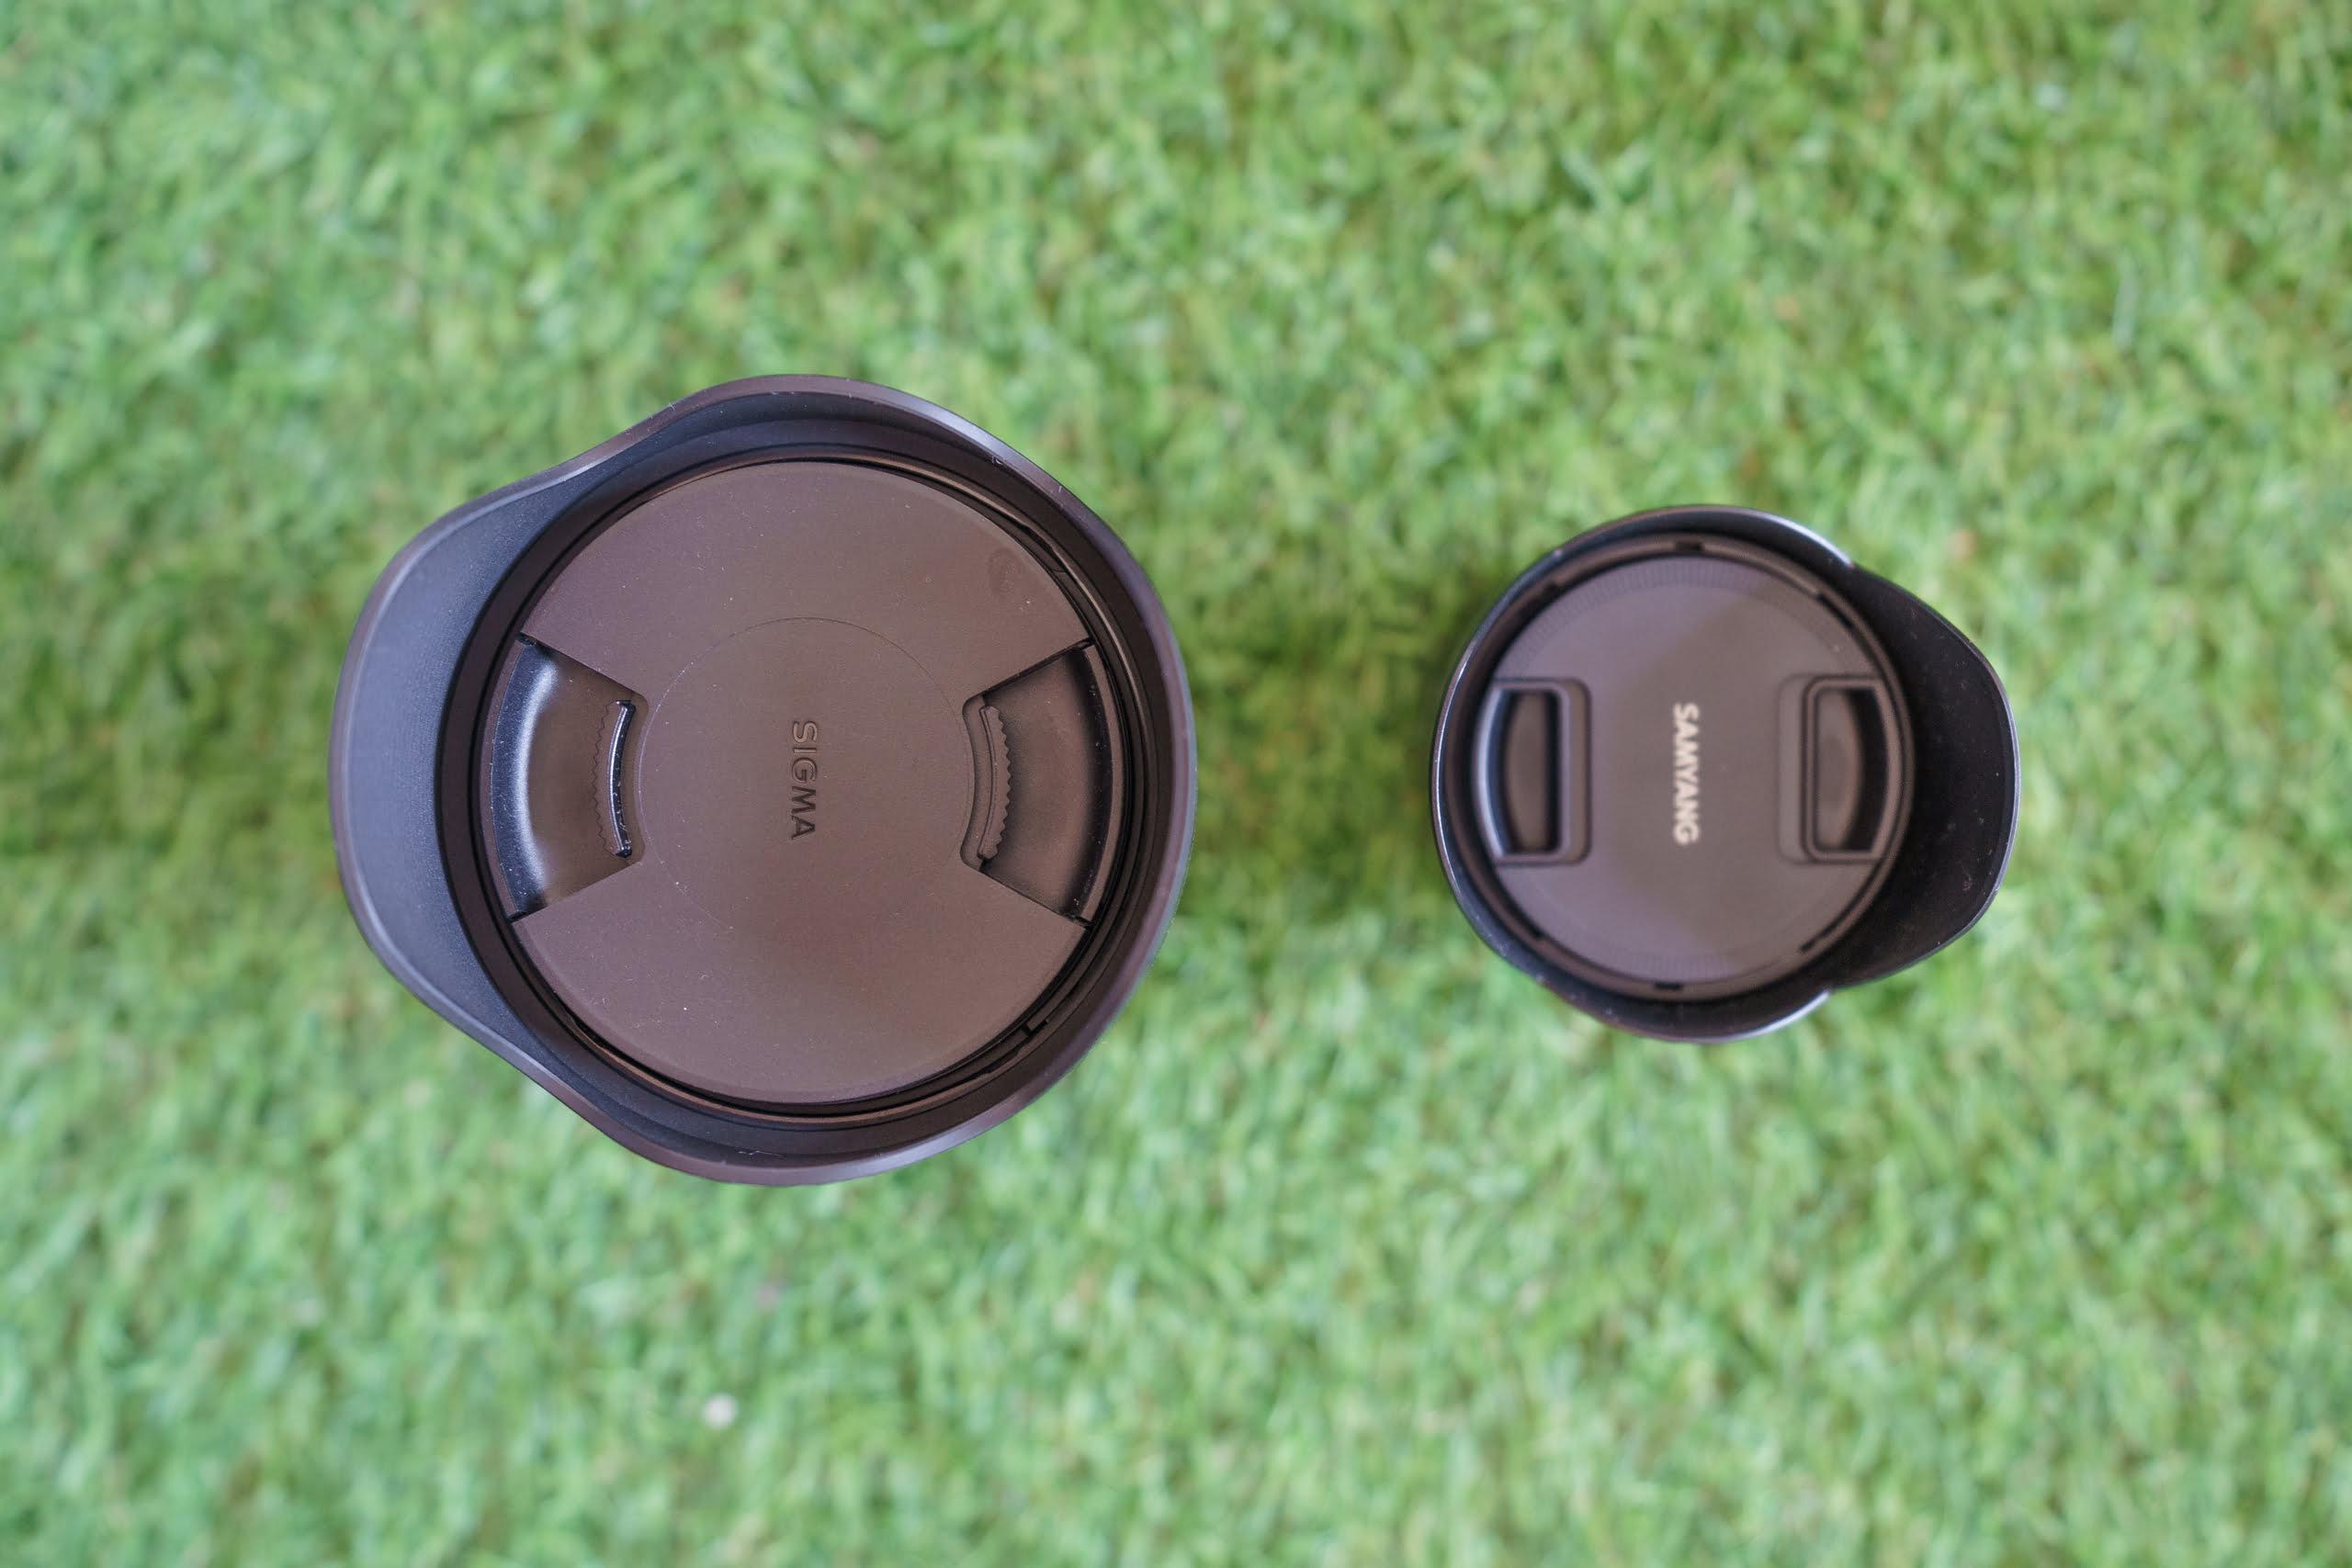 Samyang 24 mm f/1.8 vs Sigma 24 mm f/1.4